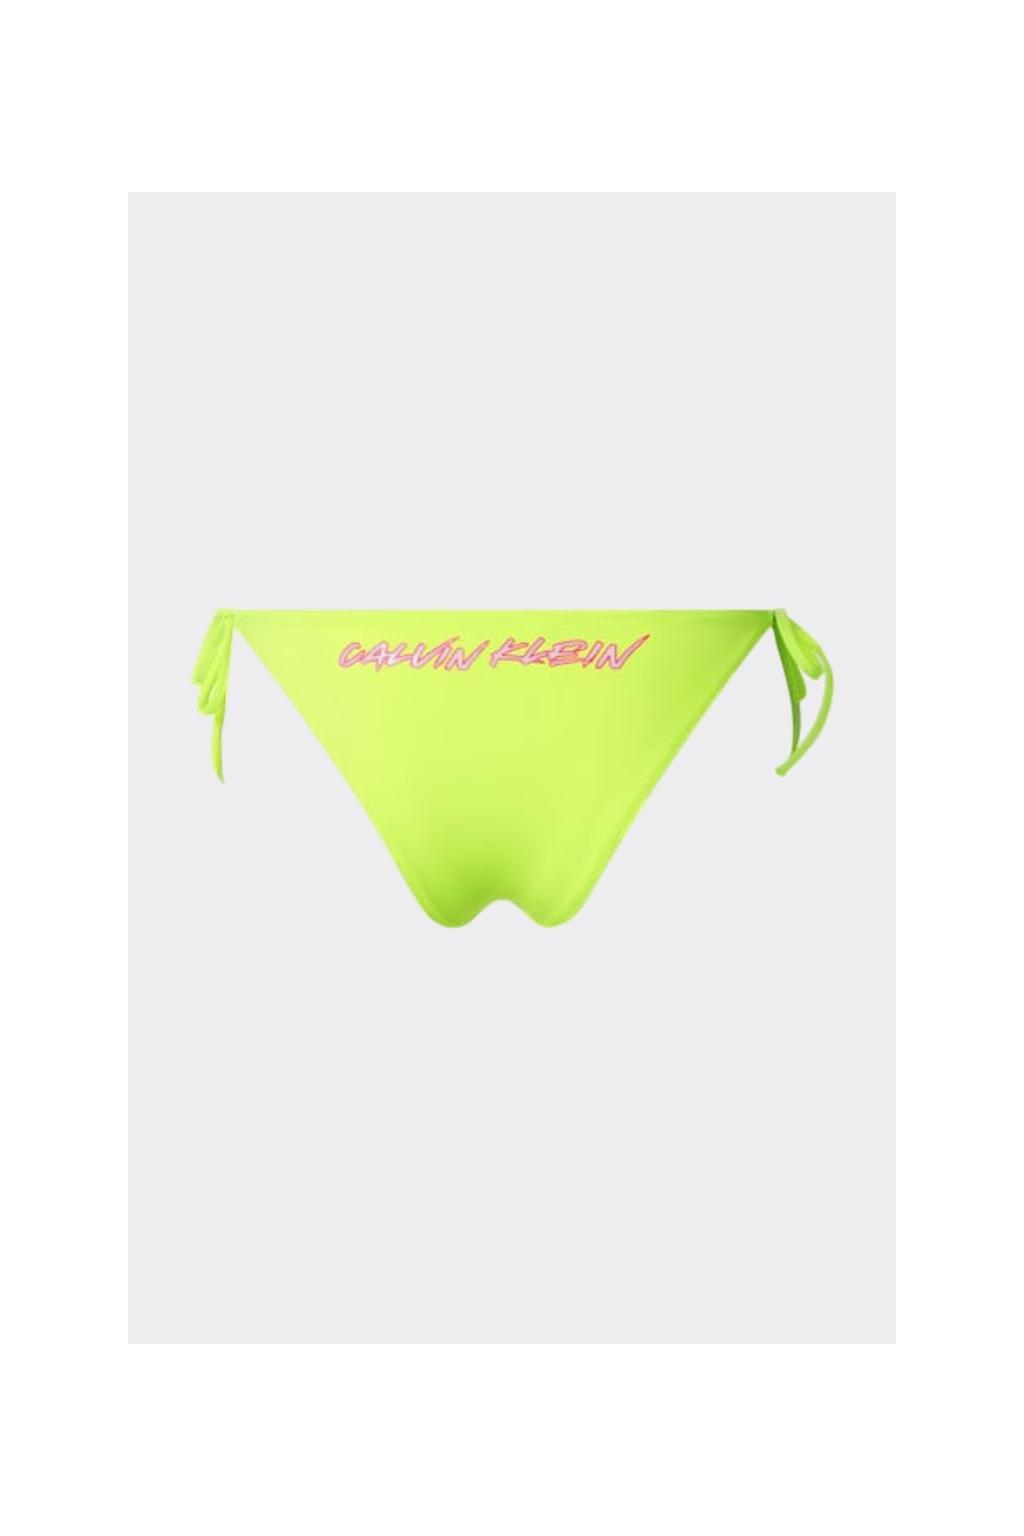 Calvin Klein cheeky spodní díl plavek - neonová